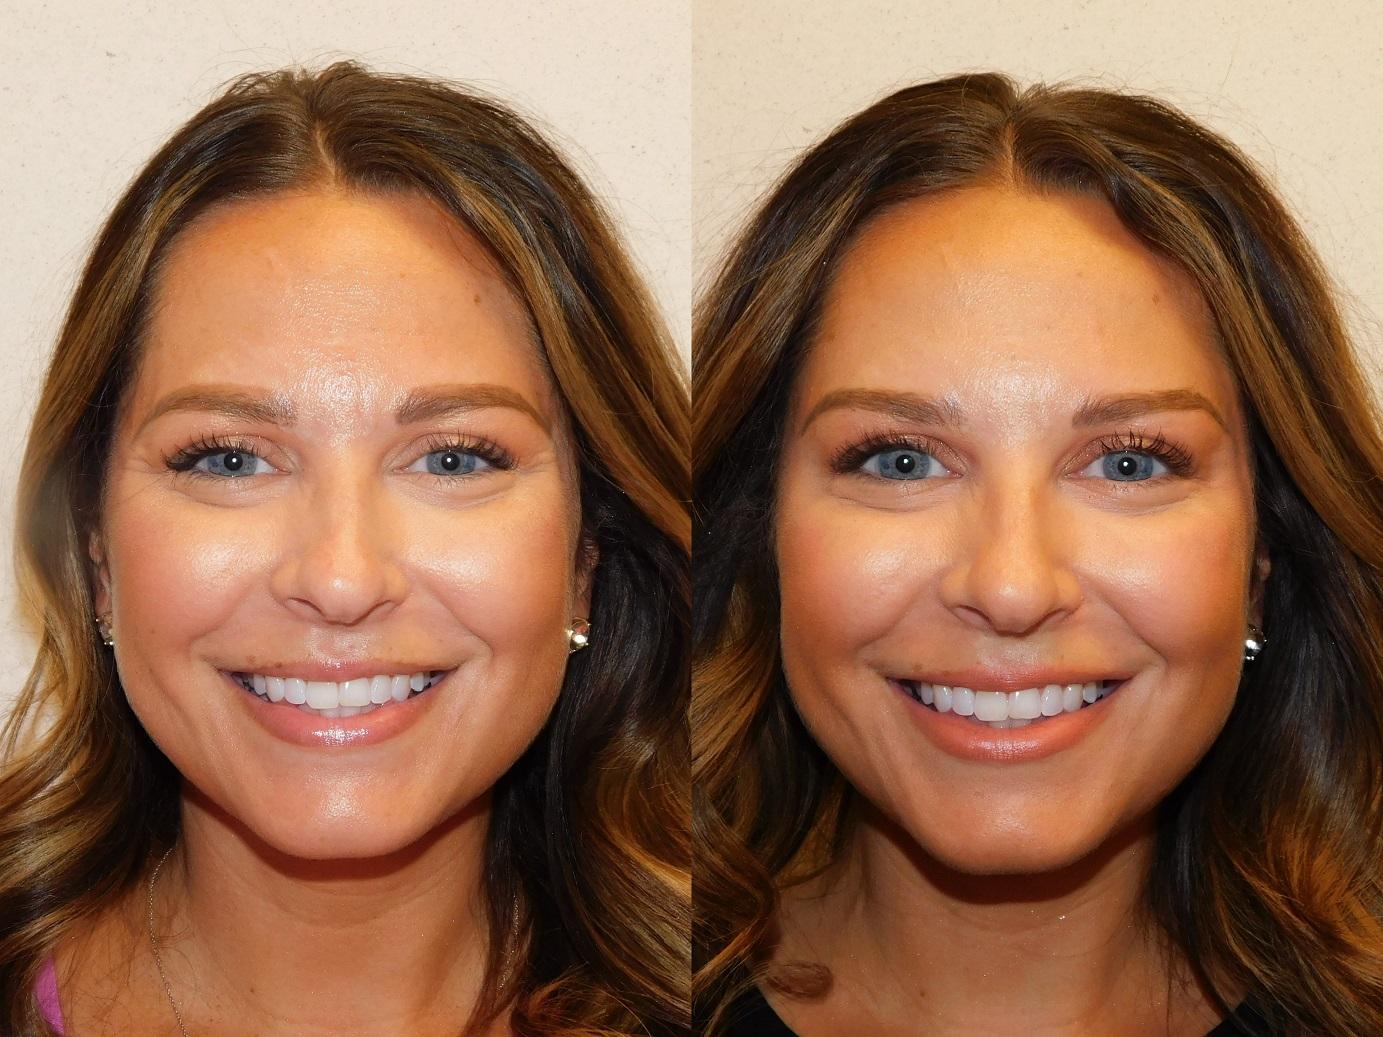 Botox results-Jeuveau-#NEWTOX-Dr. Joel Schlessinger-LovelySkin Omaha-Omaha Blogger-Omaha Beauty Blogger-Beauty Blog Post-Botox Results-Sabby Style-7